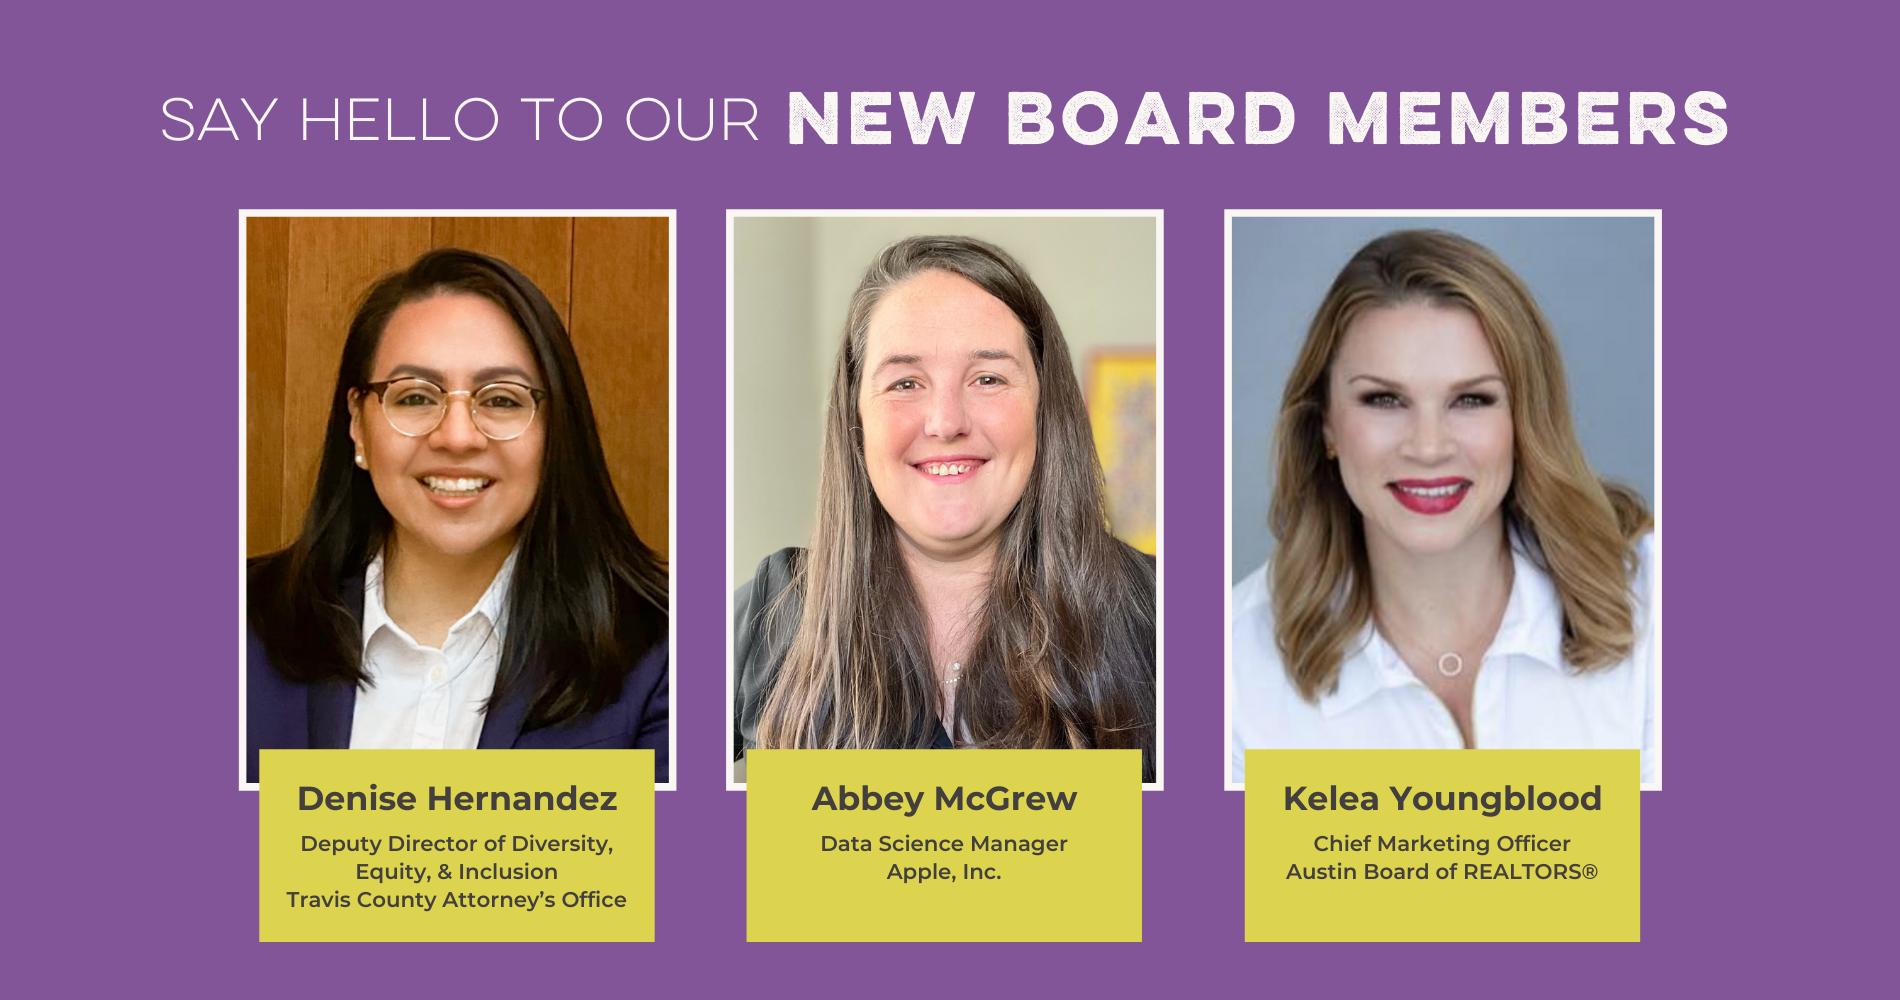 New Board Members Image